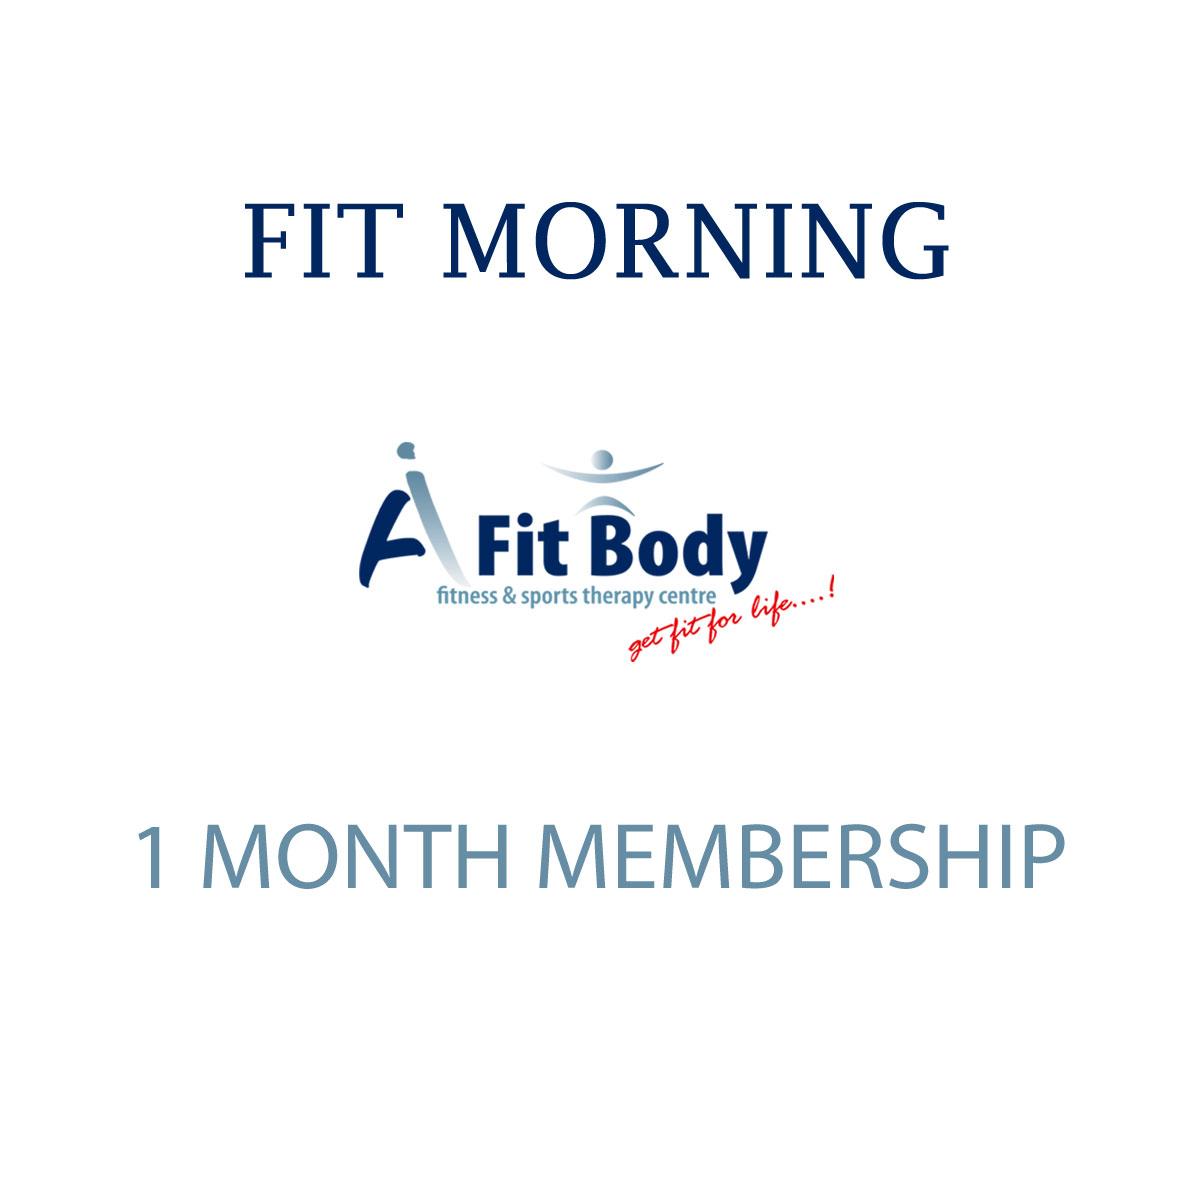 Fit Morning - 1 Month Membership